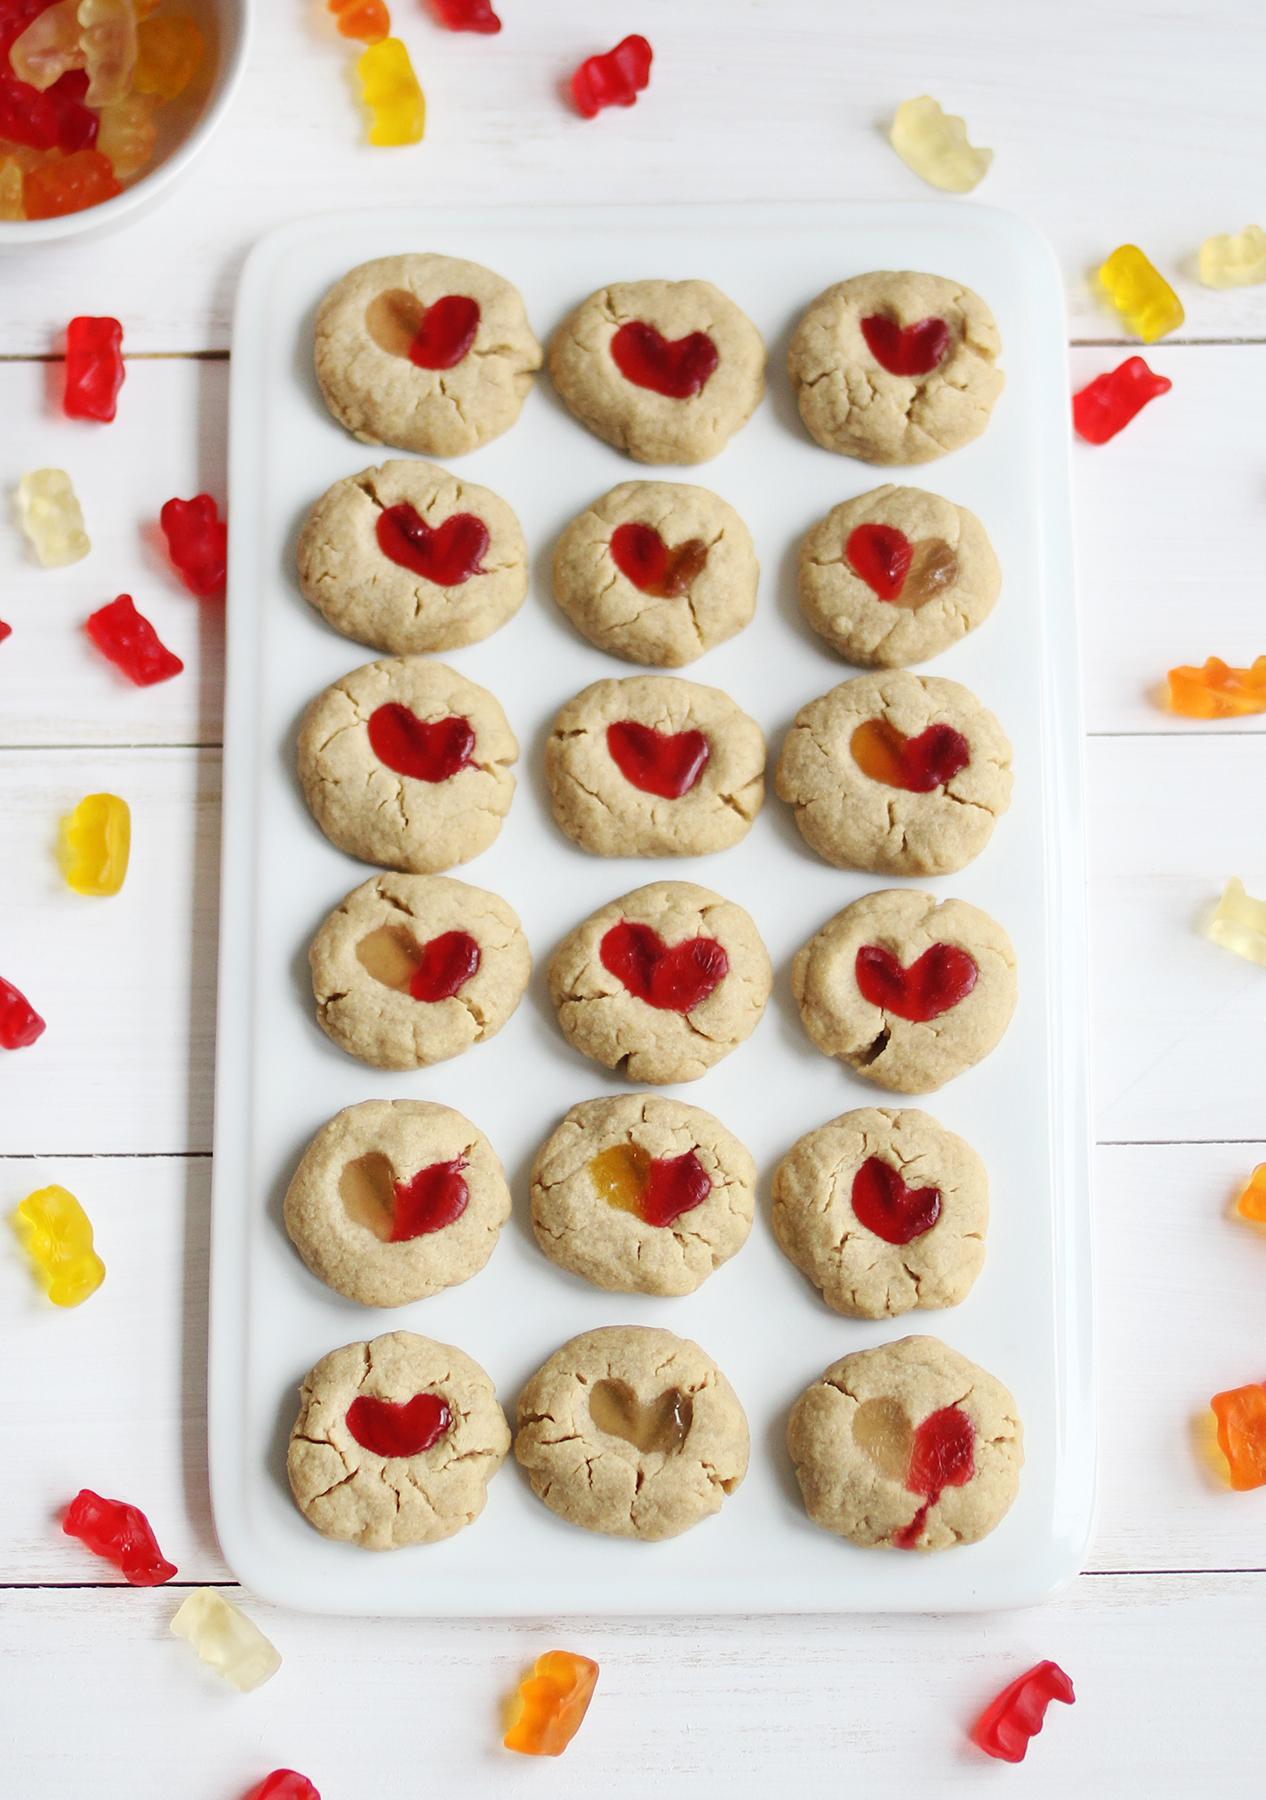 Gummy bear cookies